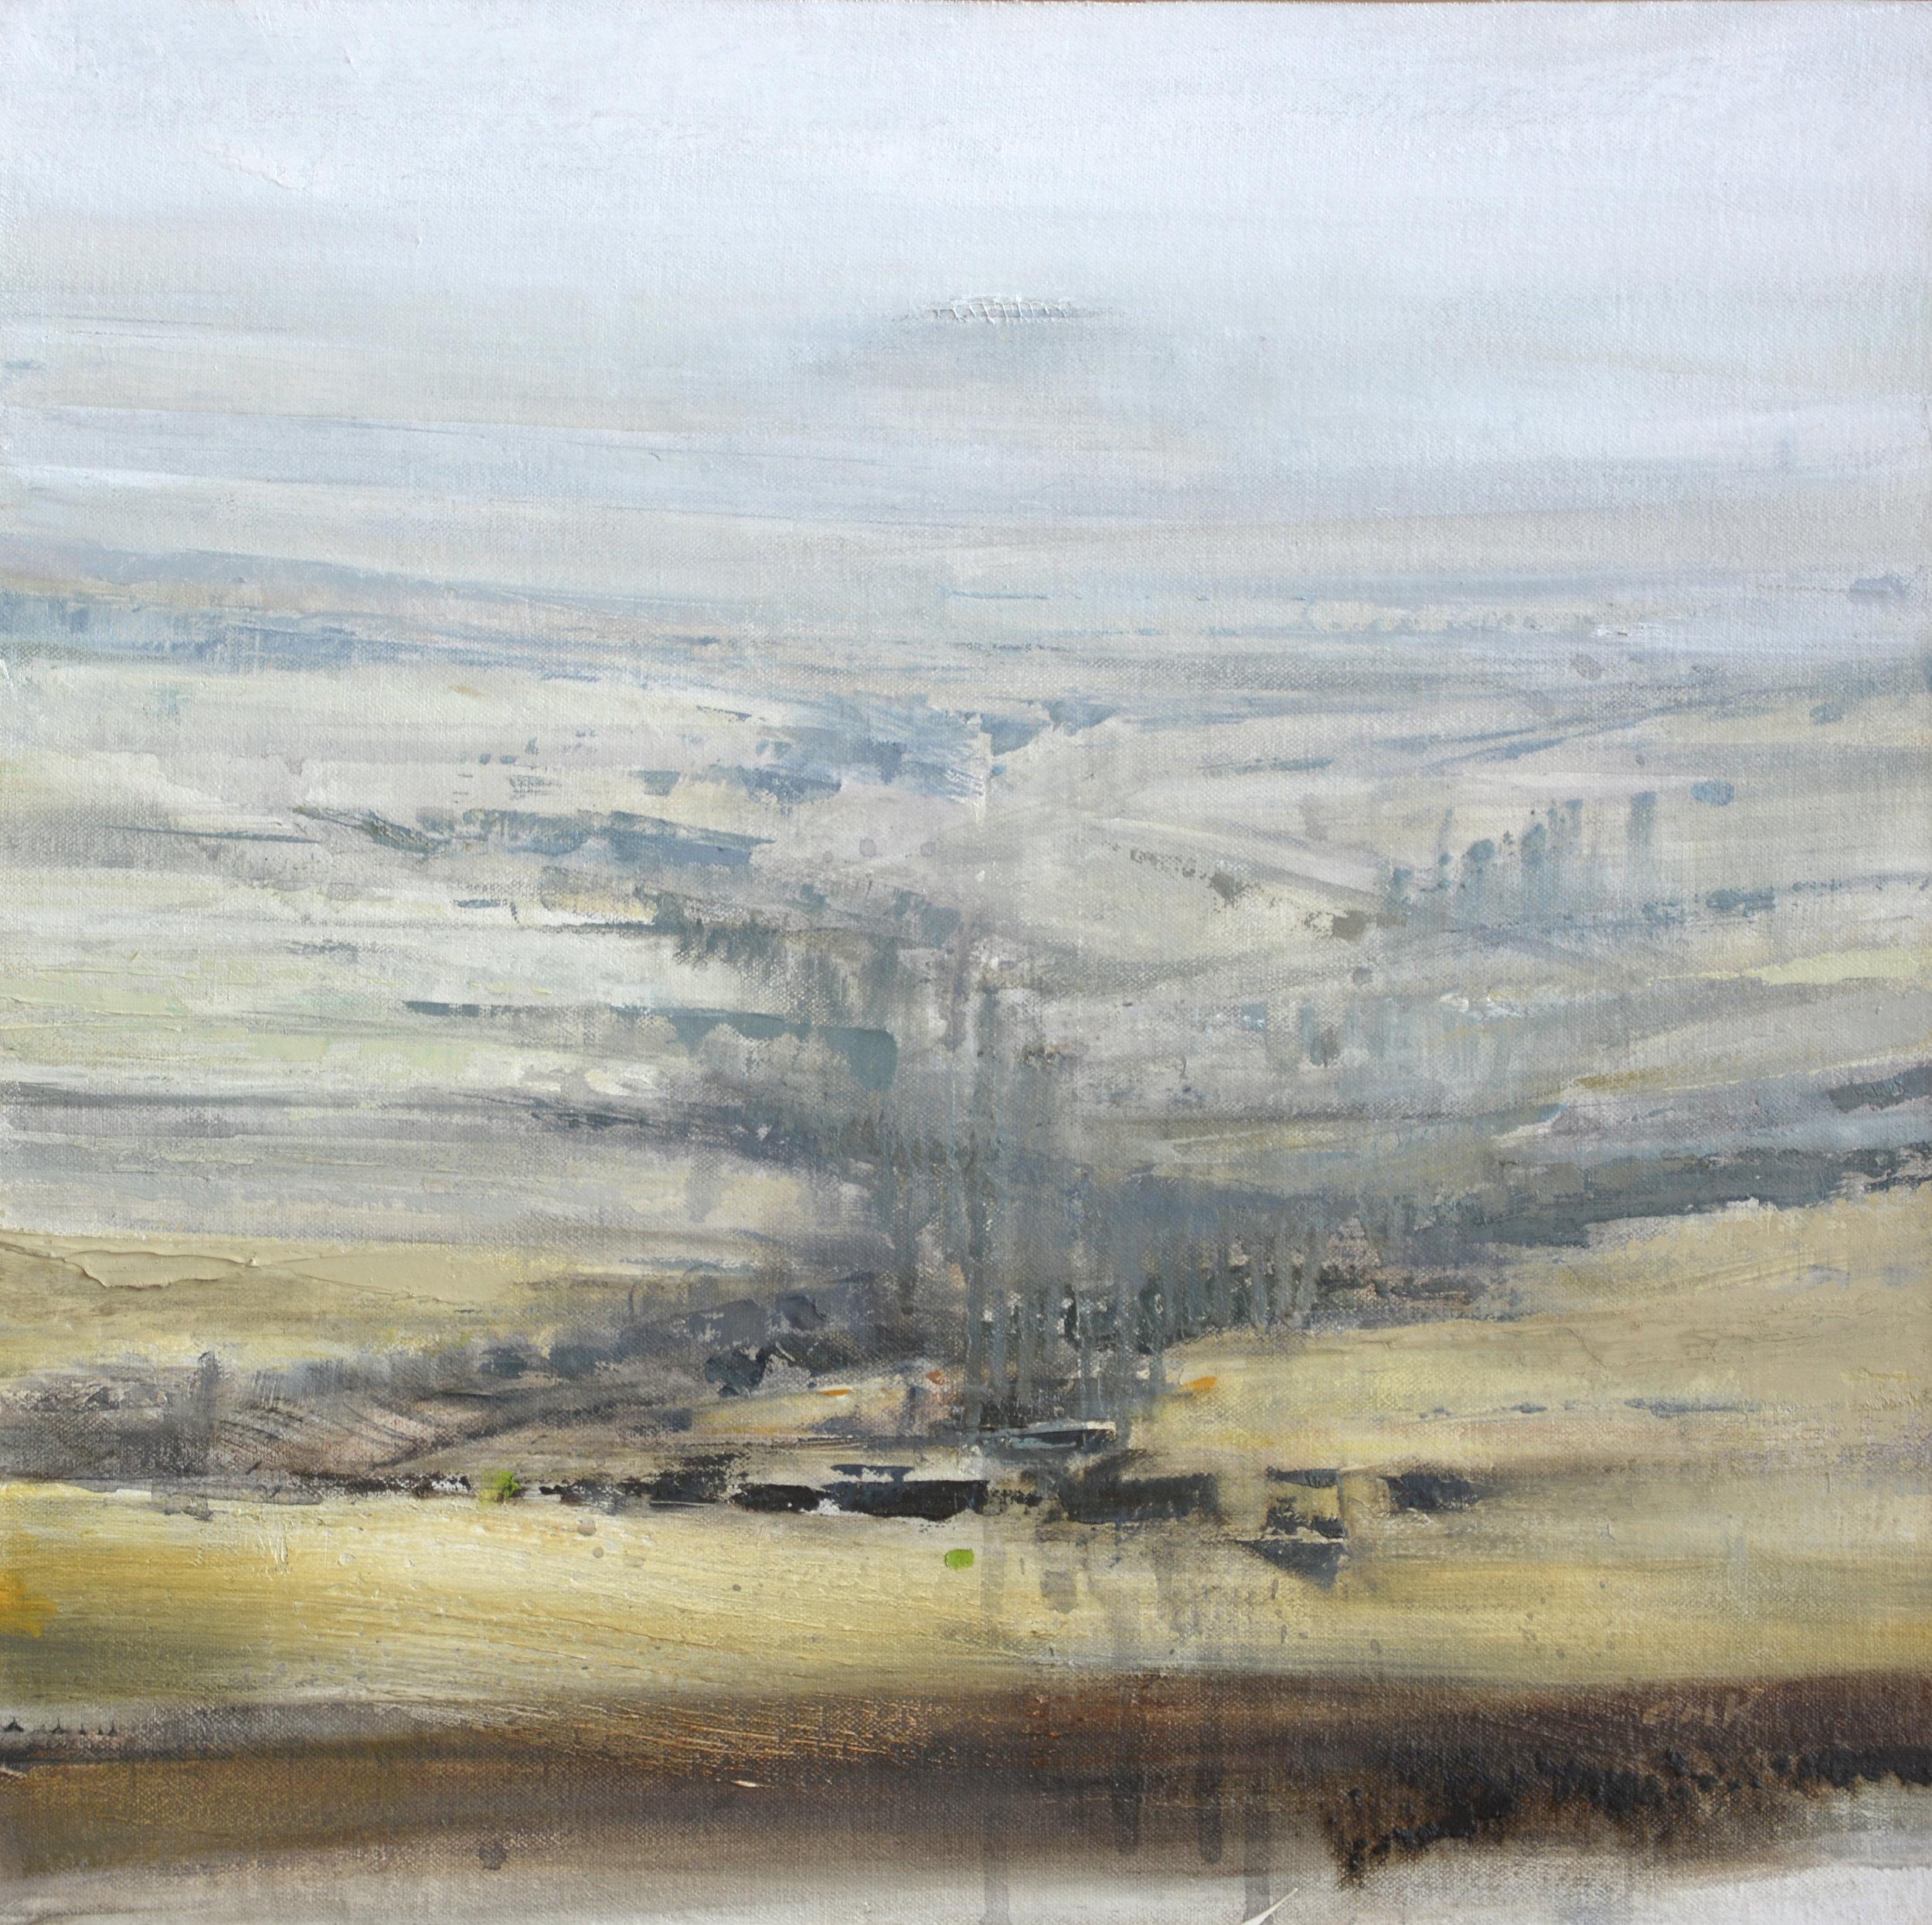 "Boulder Creek   oil on canvas  16 x 16""  2016"